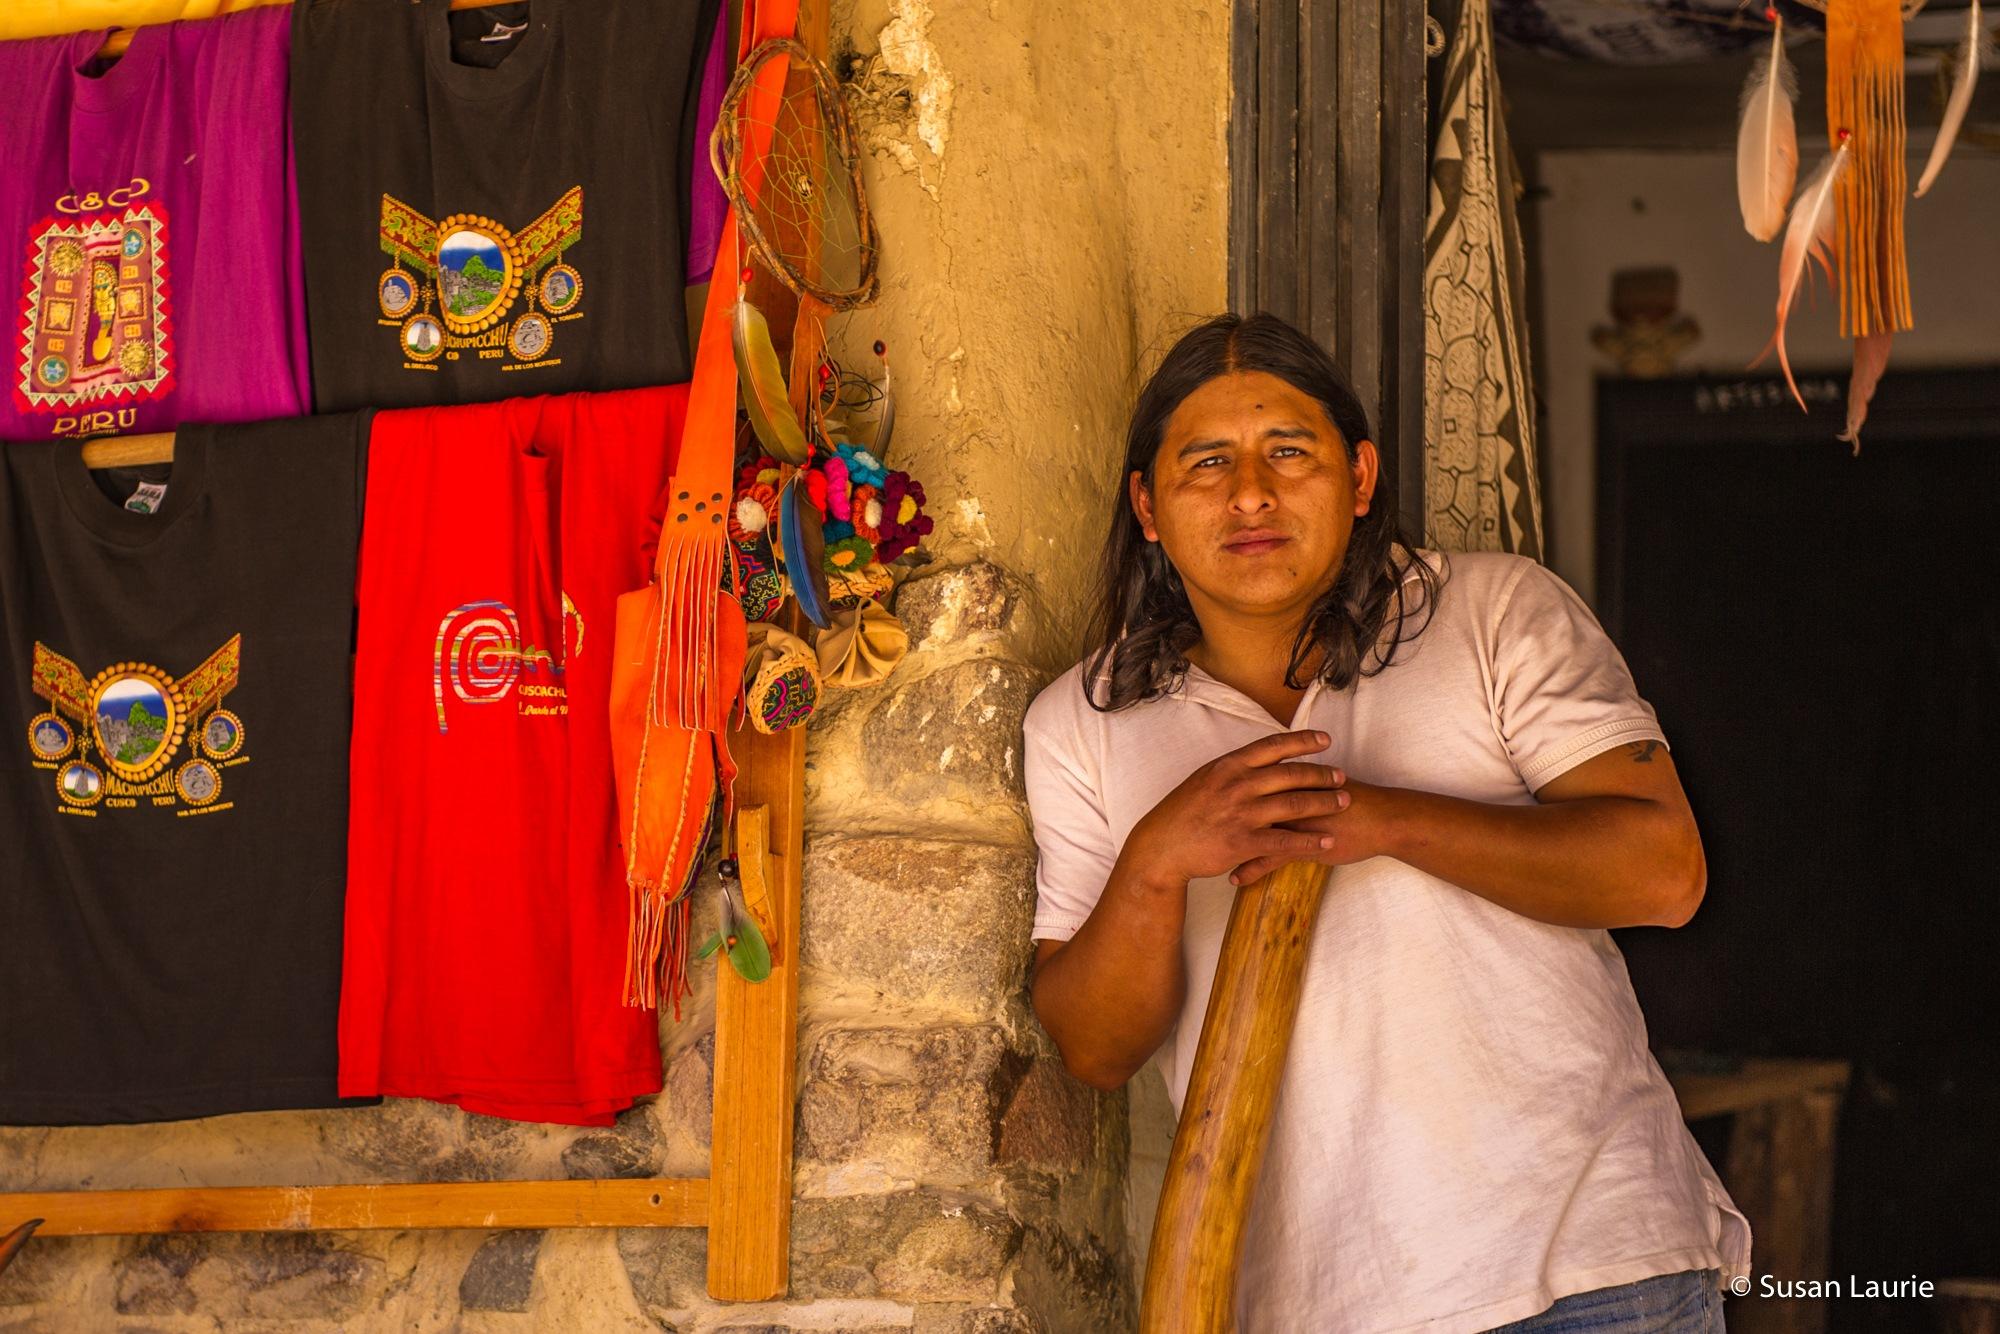 Peru Portraits by Susan Laurie